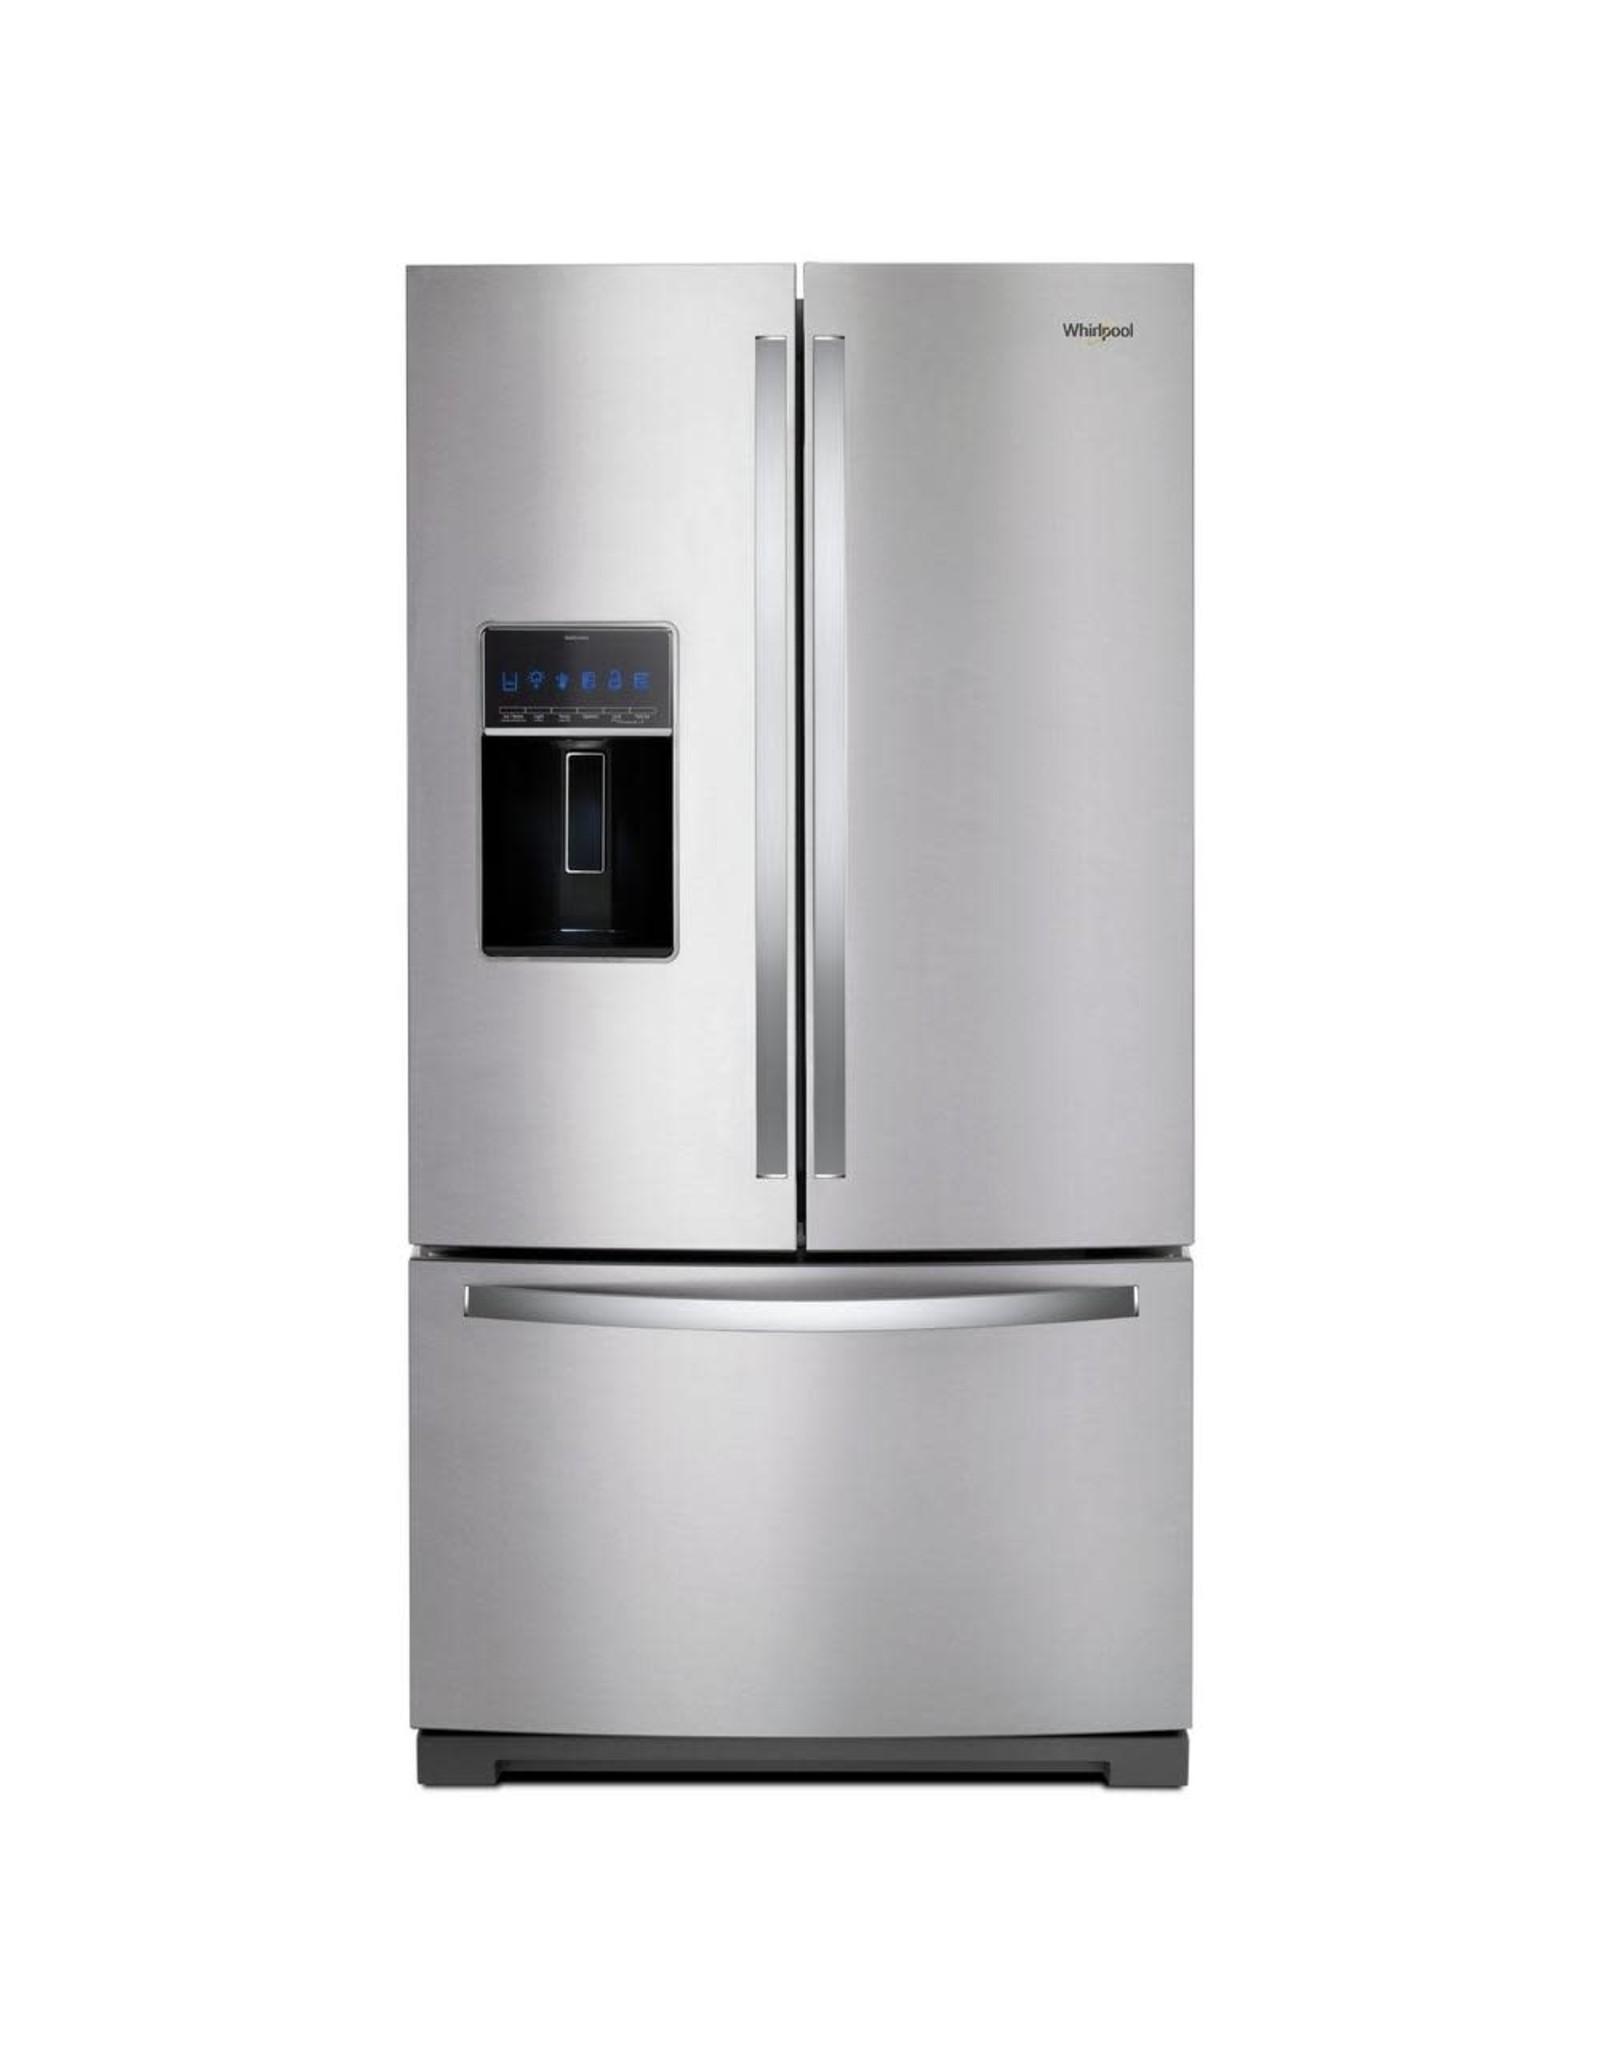 WHIRLPOOL WRF757SDHZ 27 cu. ft. French Door Refrigerator in Fingerprint Resistant Stainless Steel